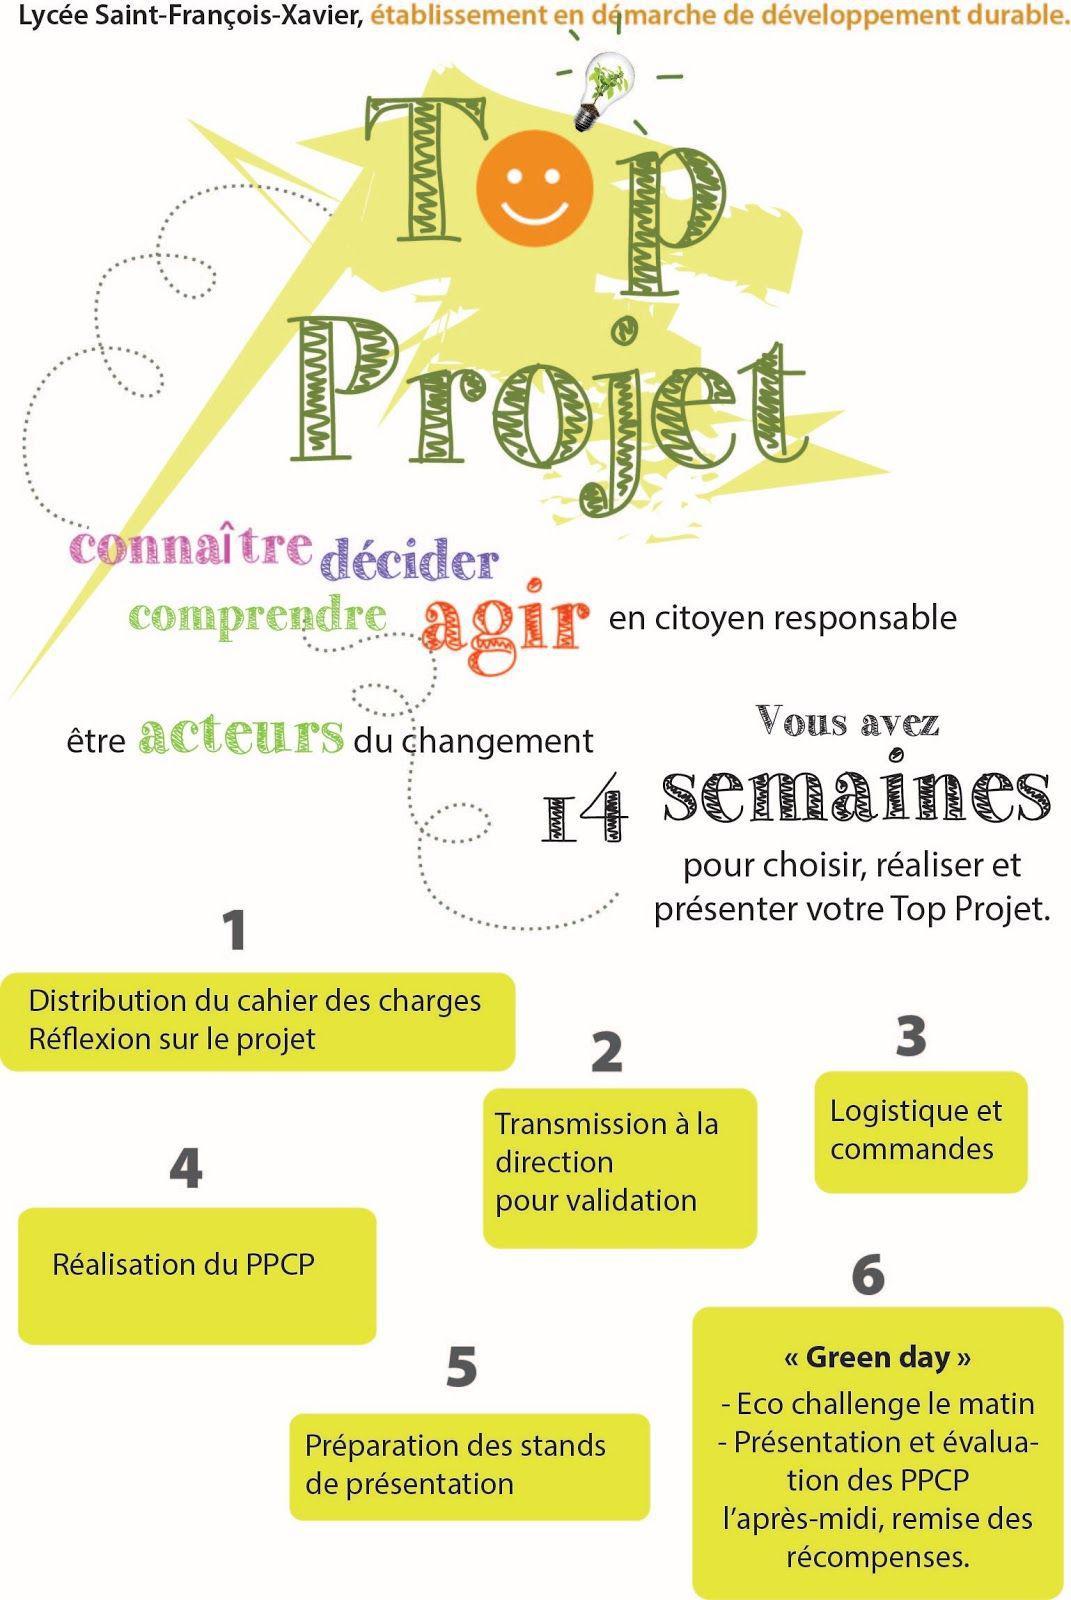 Top projet